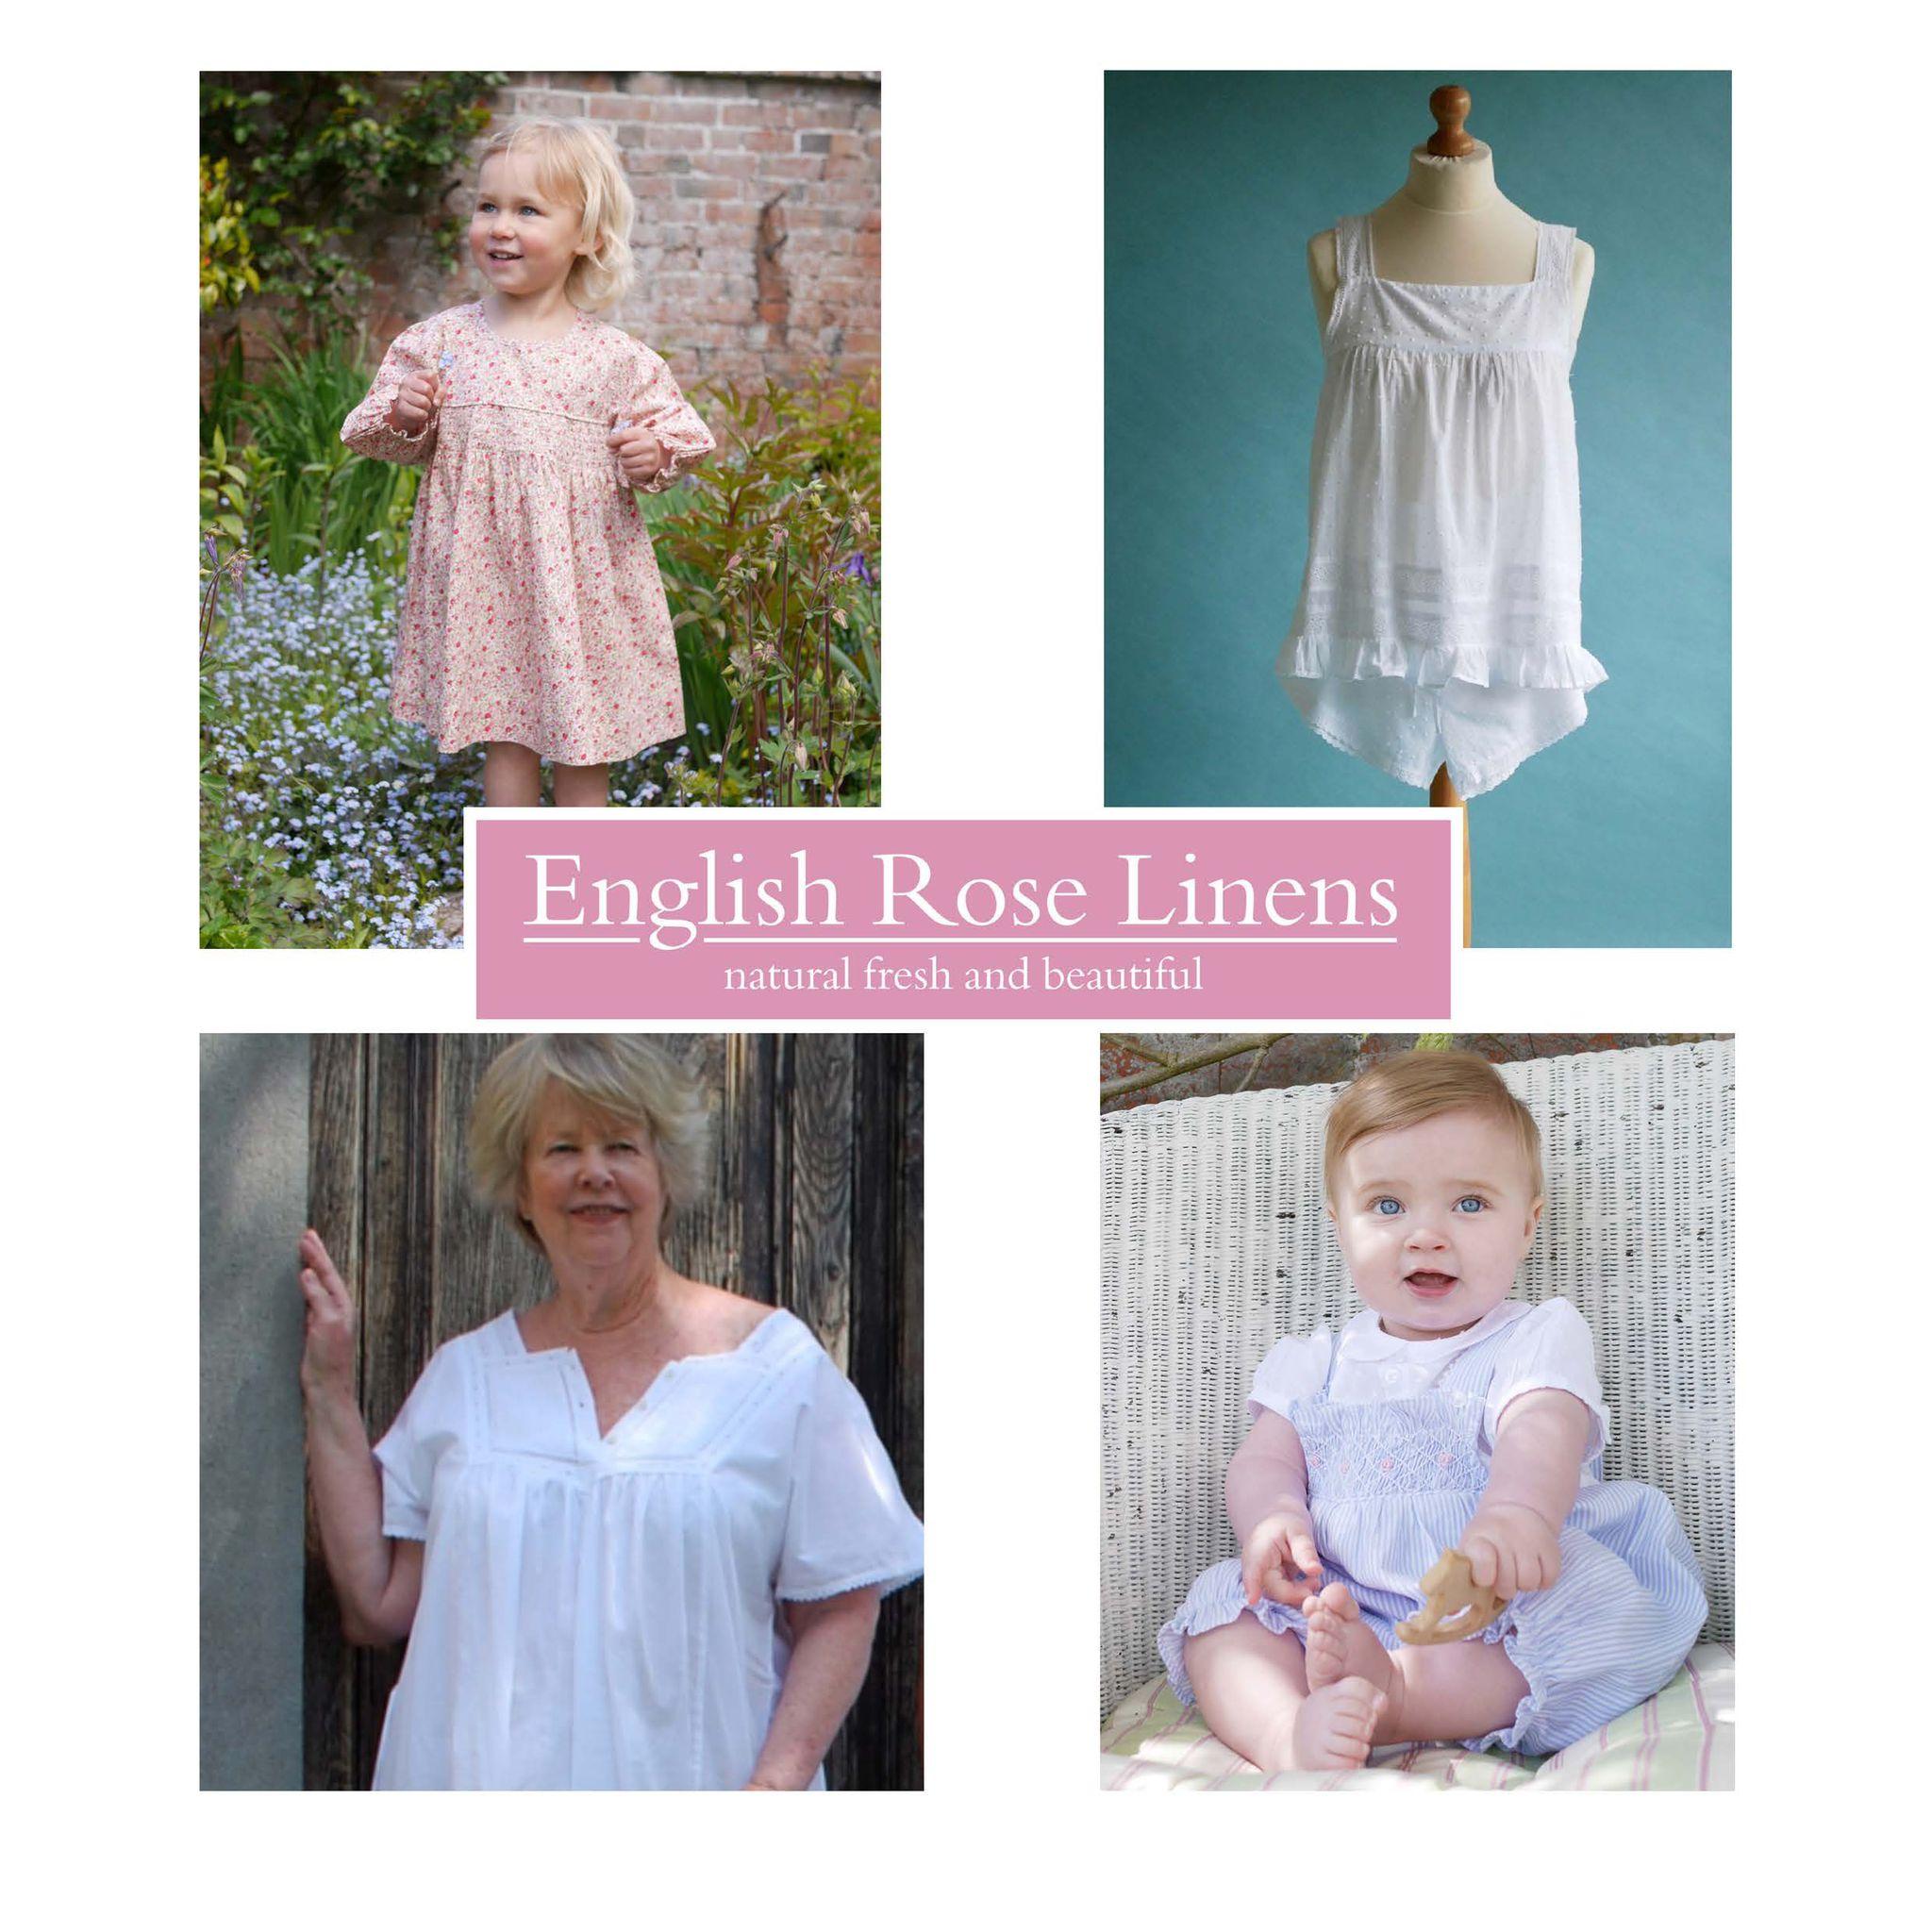 english rose linens cotton nighties